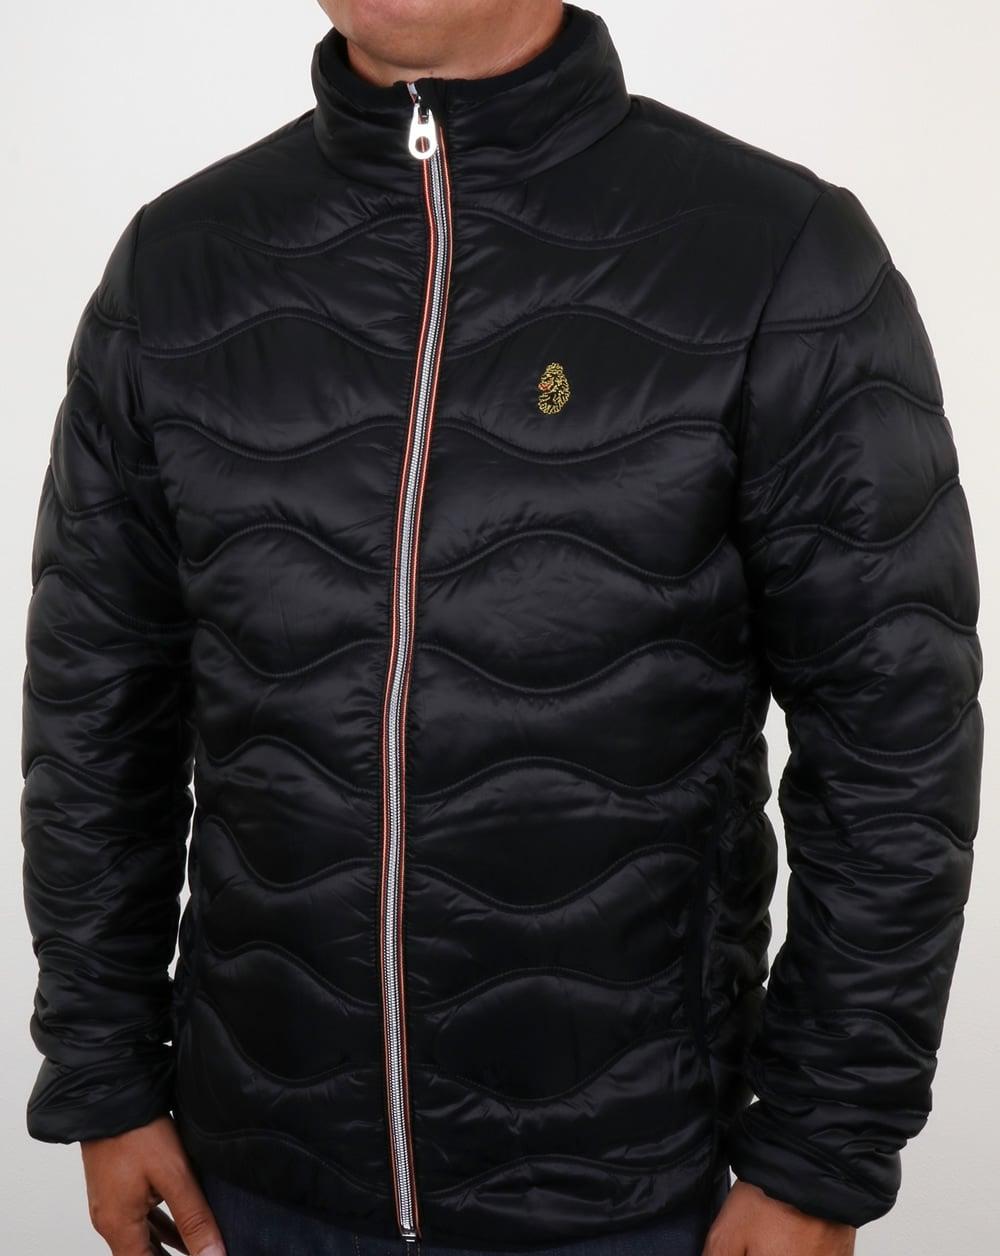 afdbf33bb9b3 Luke Ruby Quilted Jacket Black,padded,coat,mens